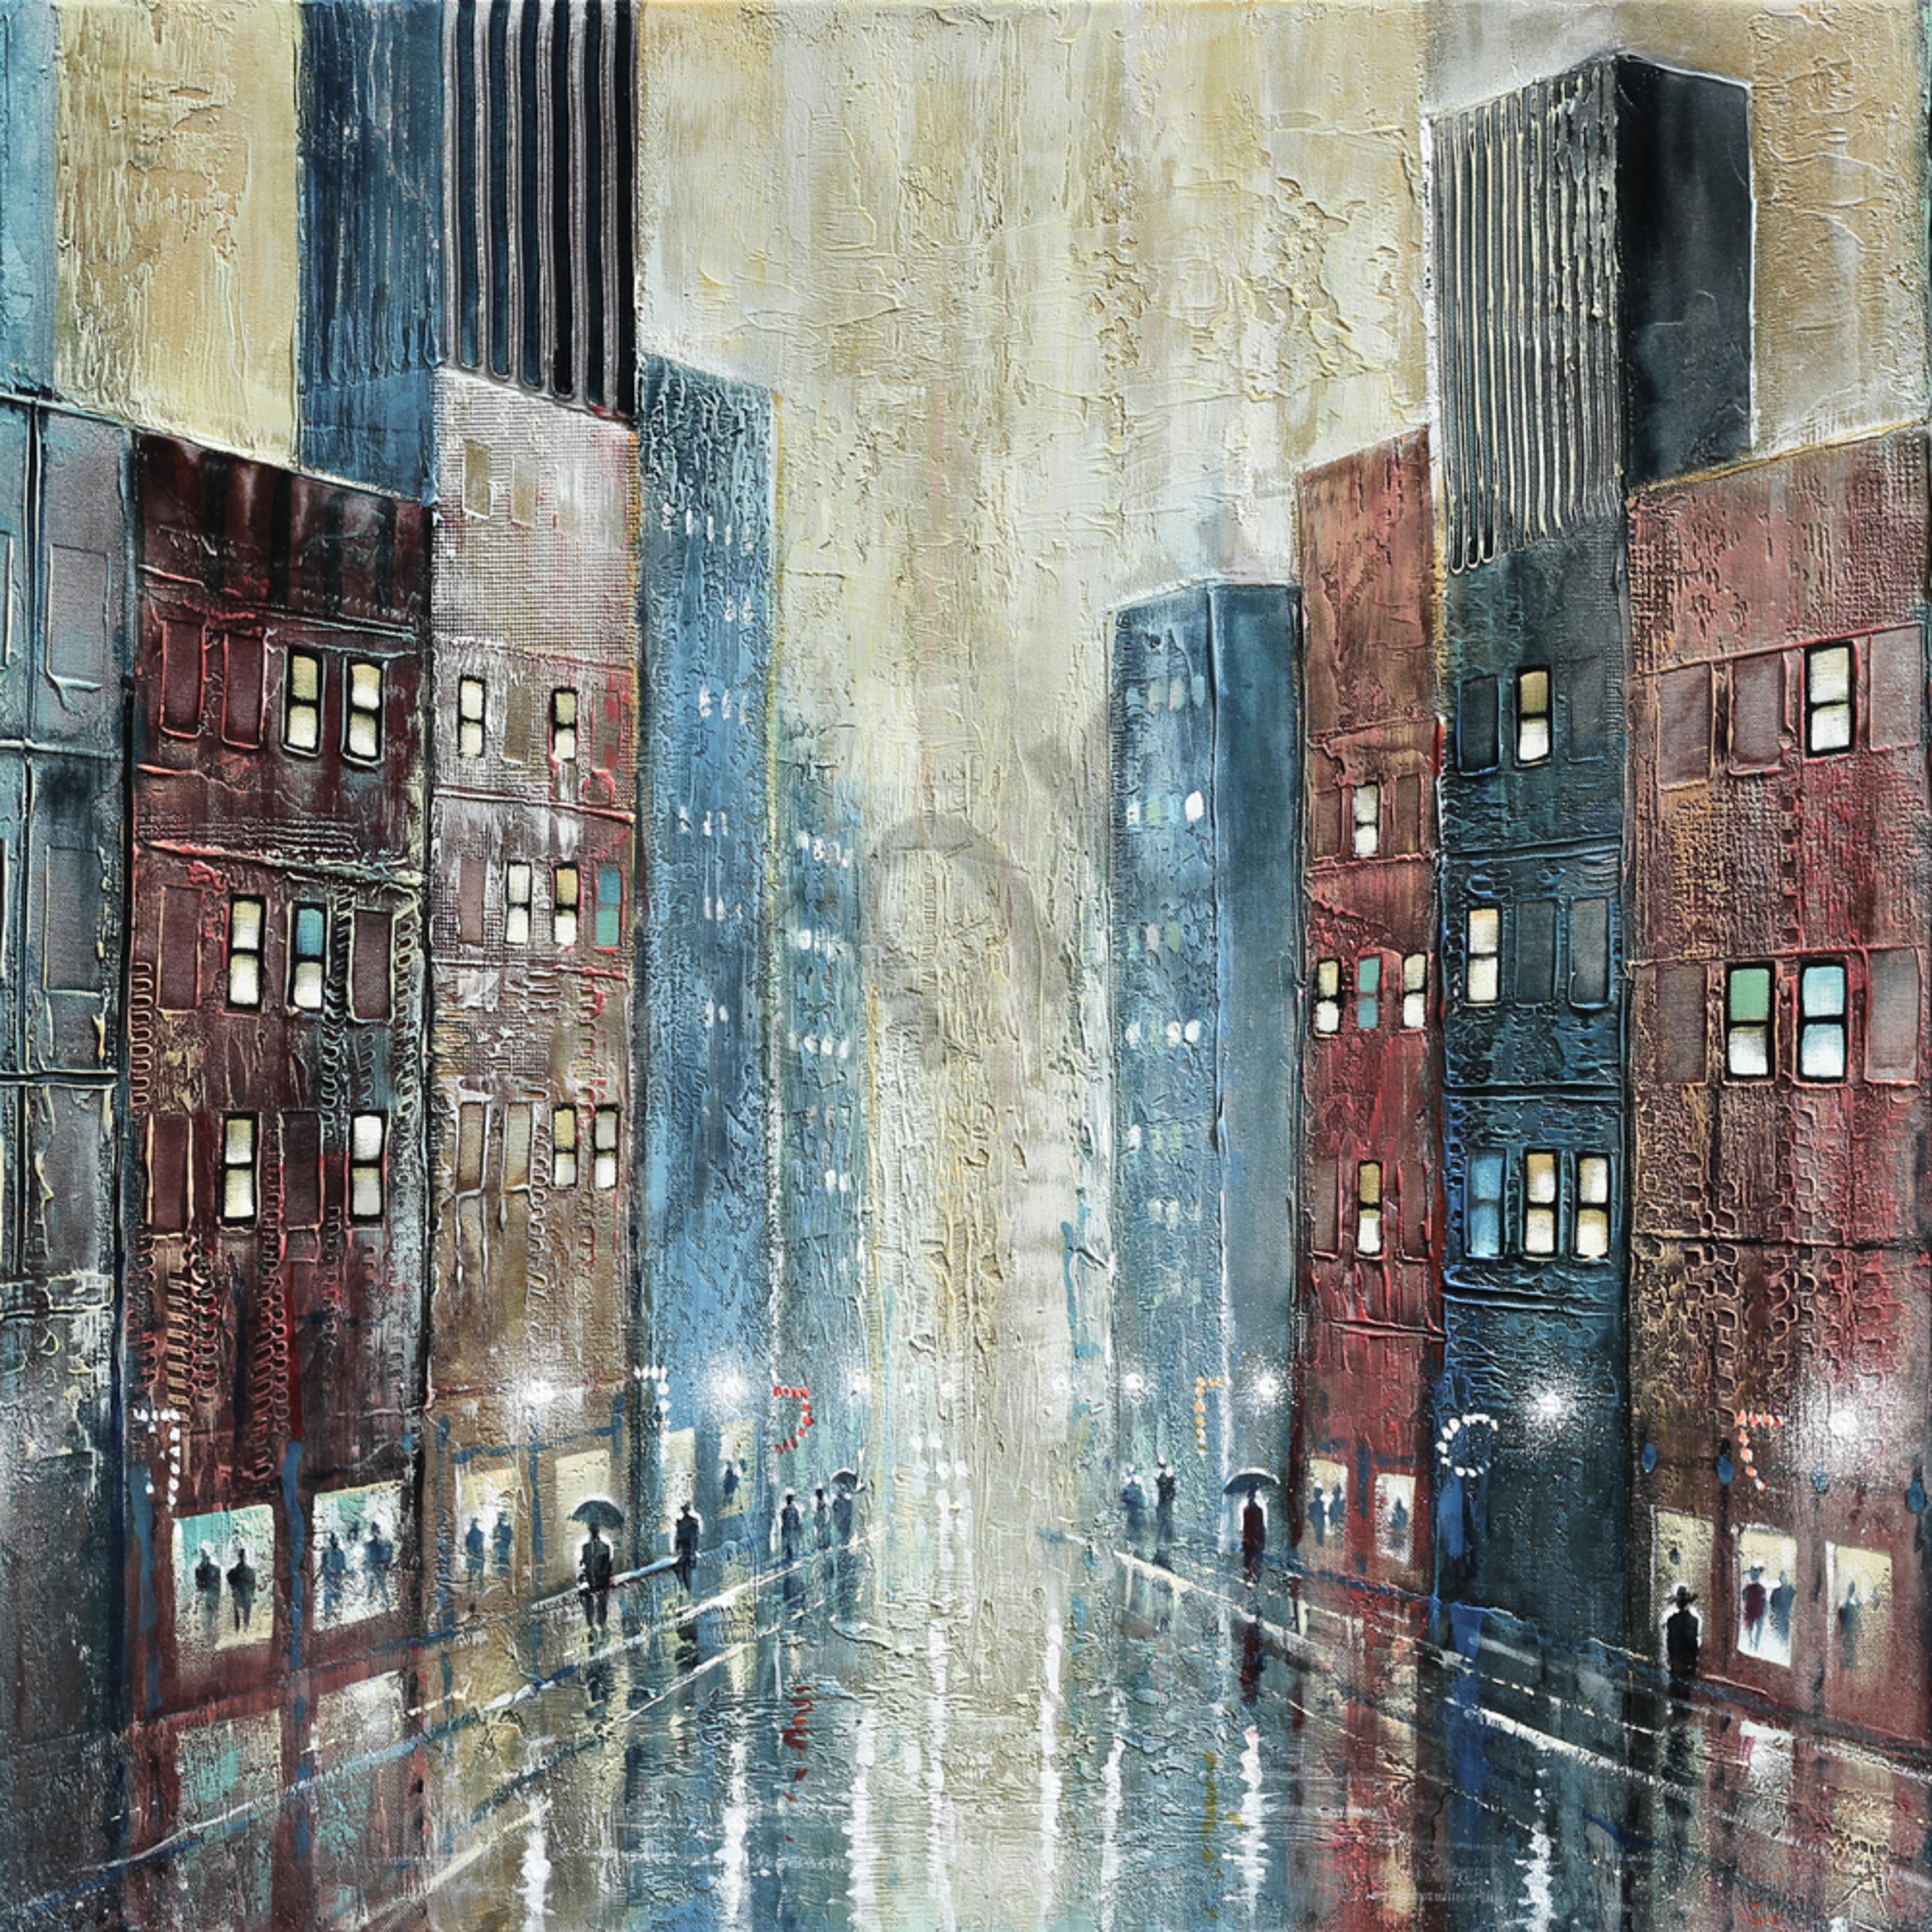 City rain 1 of 1 kbk4o1